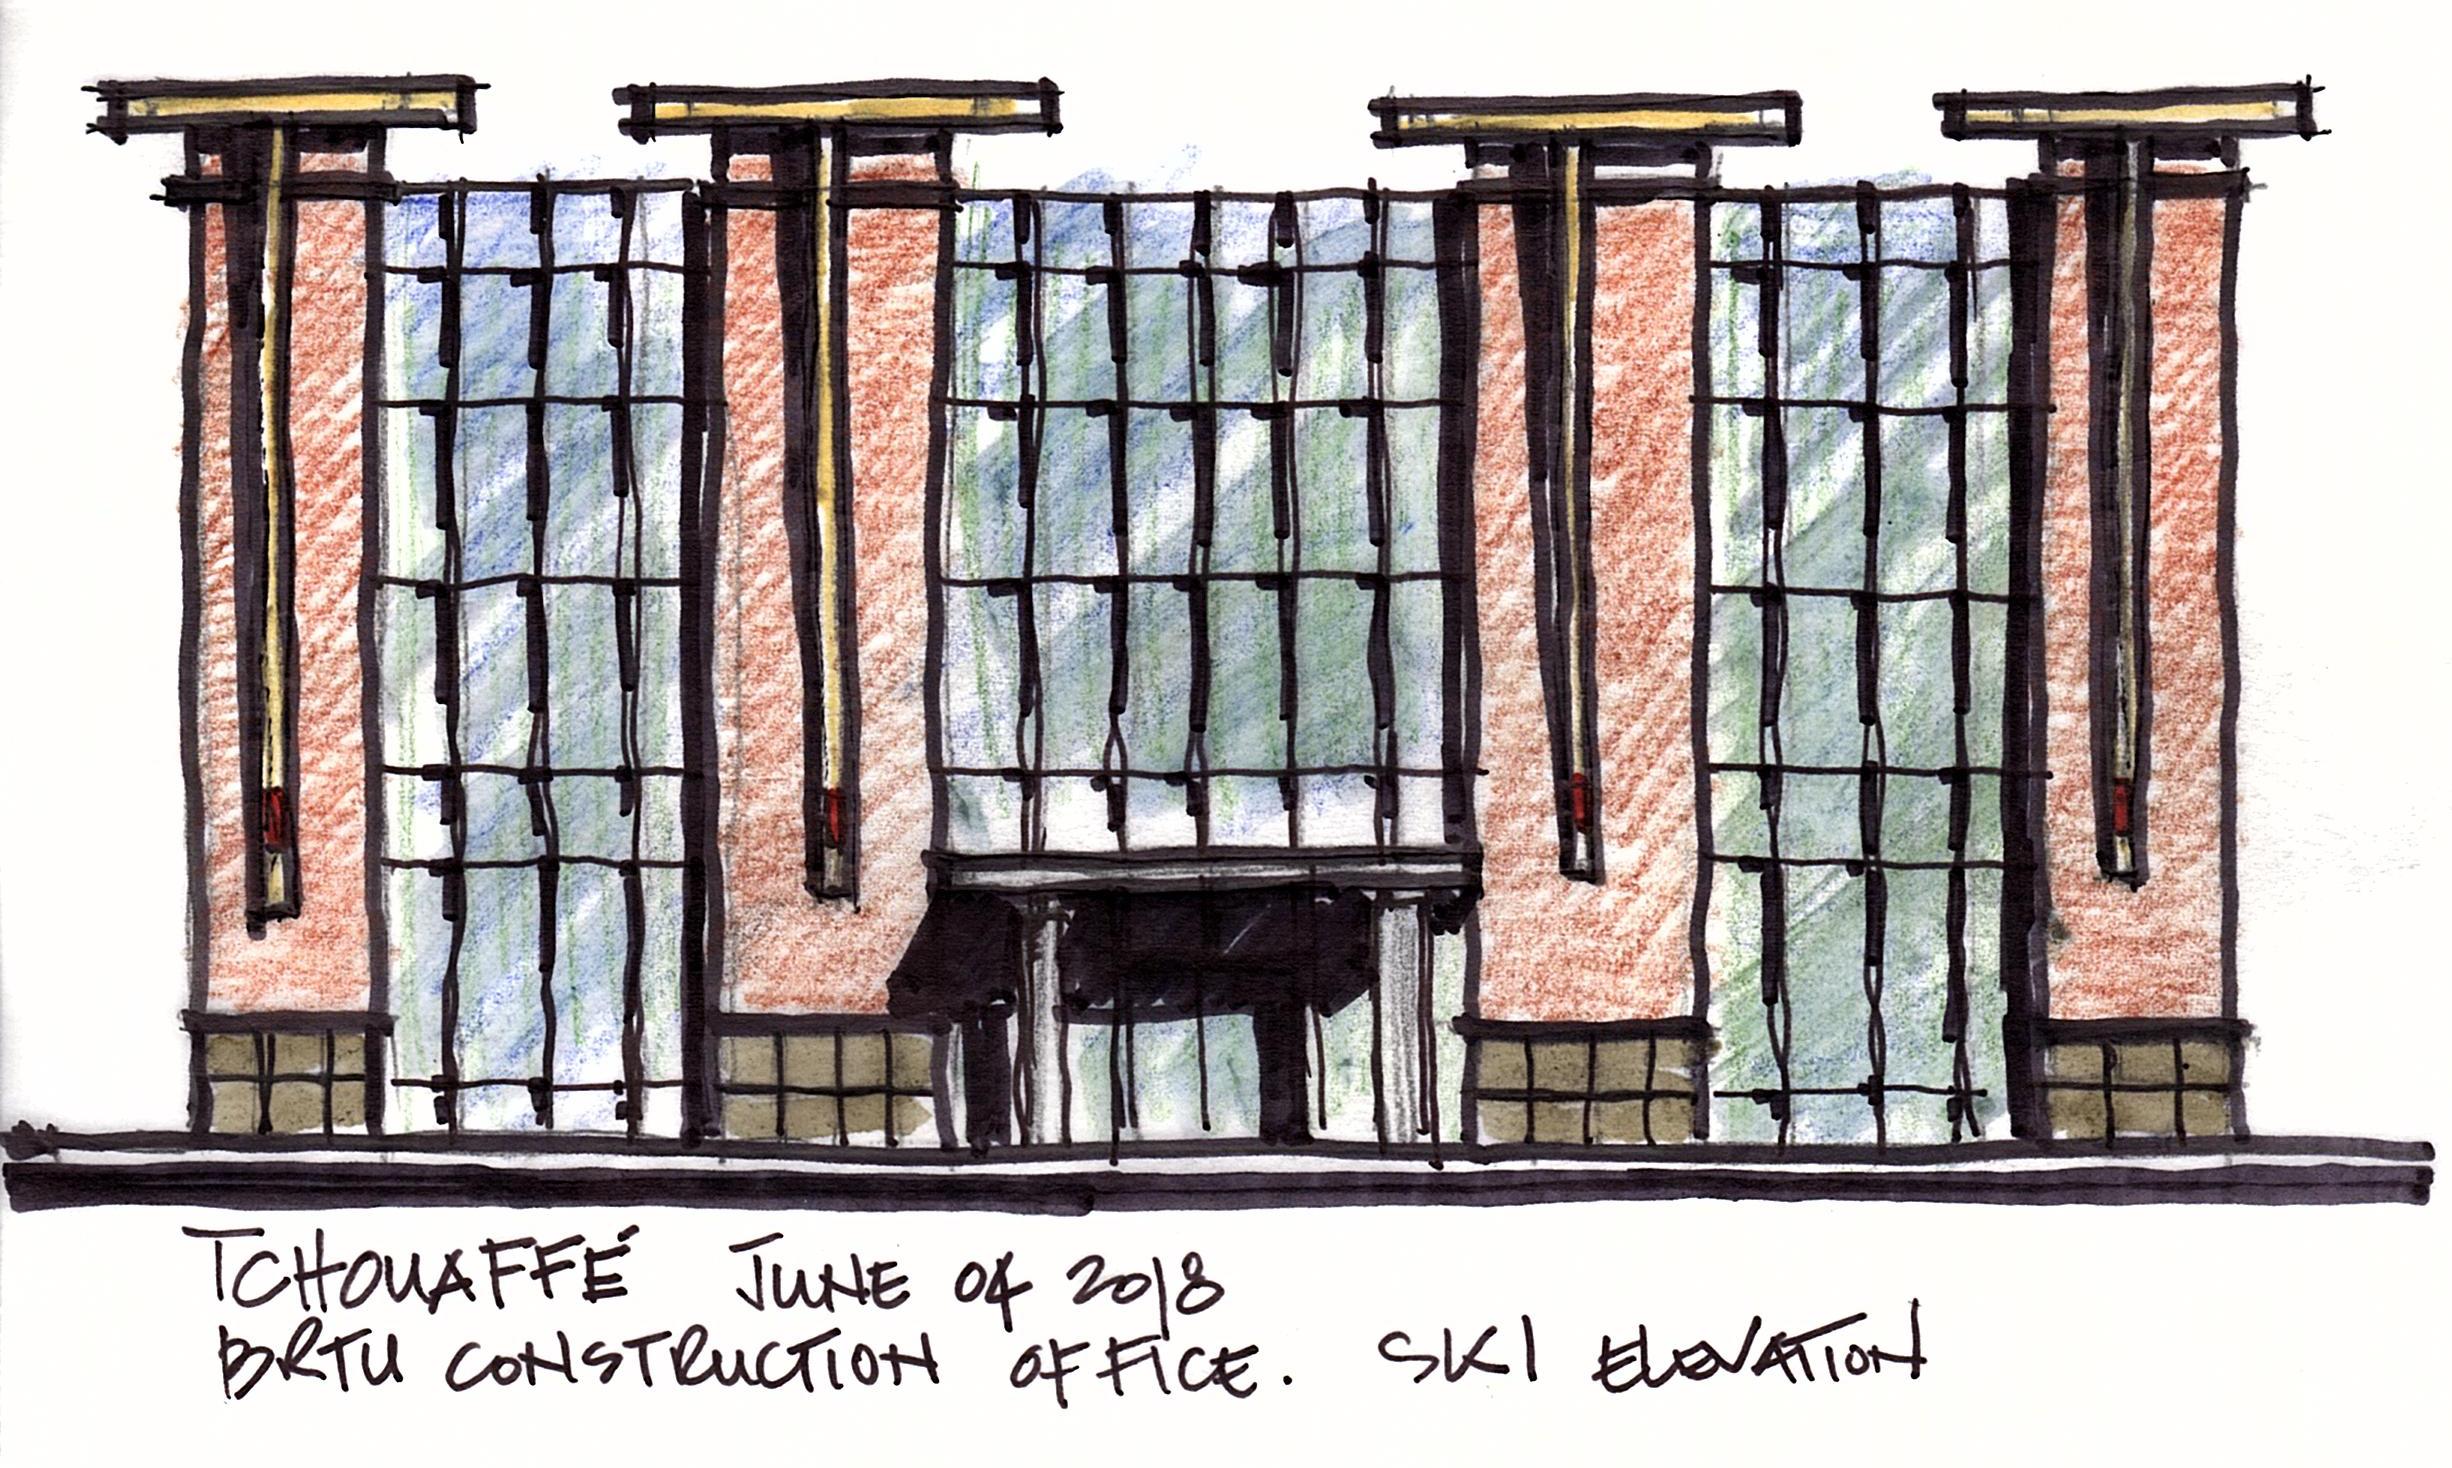 TCHOUAFFE-BRTU CONSTRUCTION-1